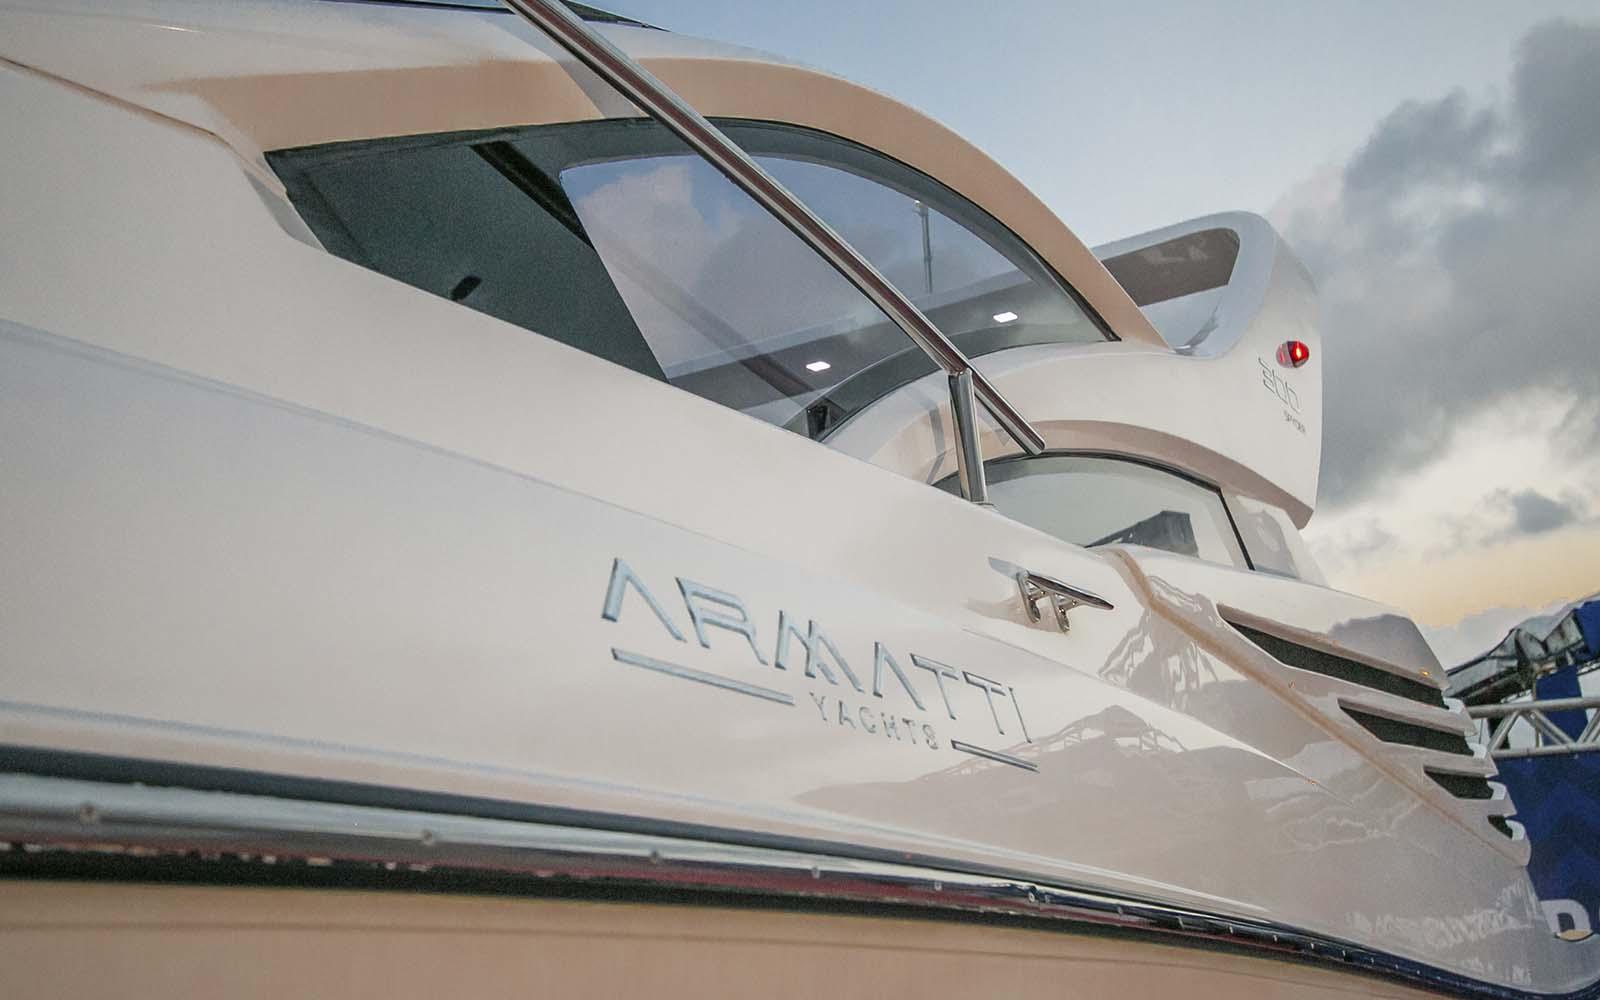 Armatti 300 Spyder - boat shopping